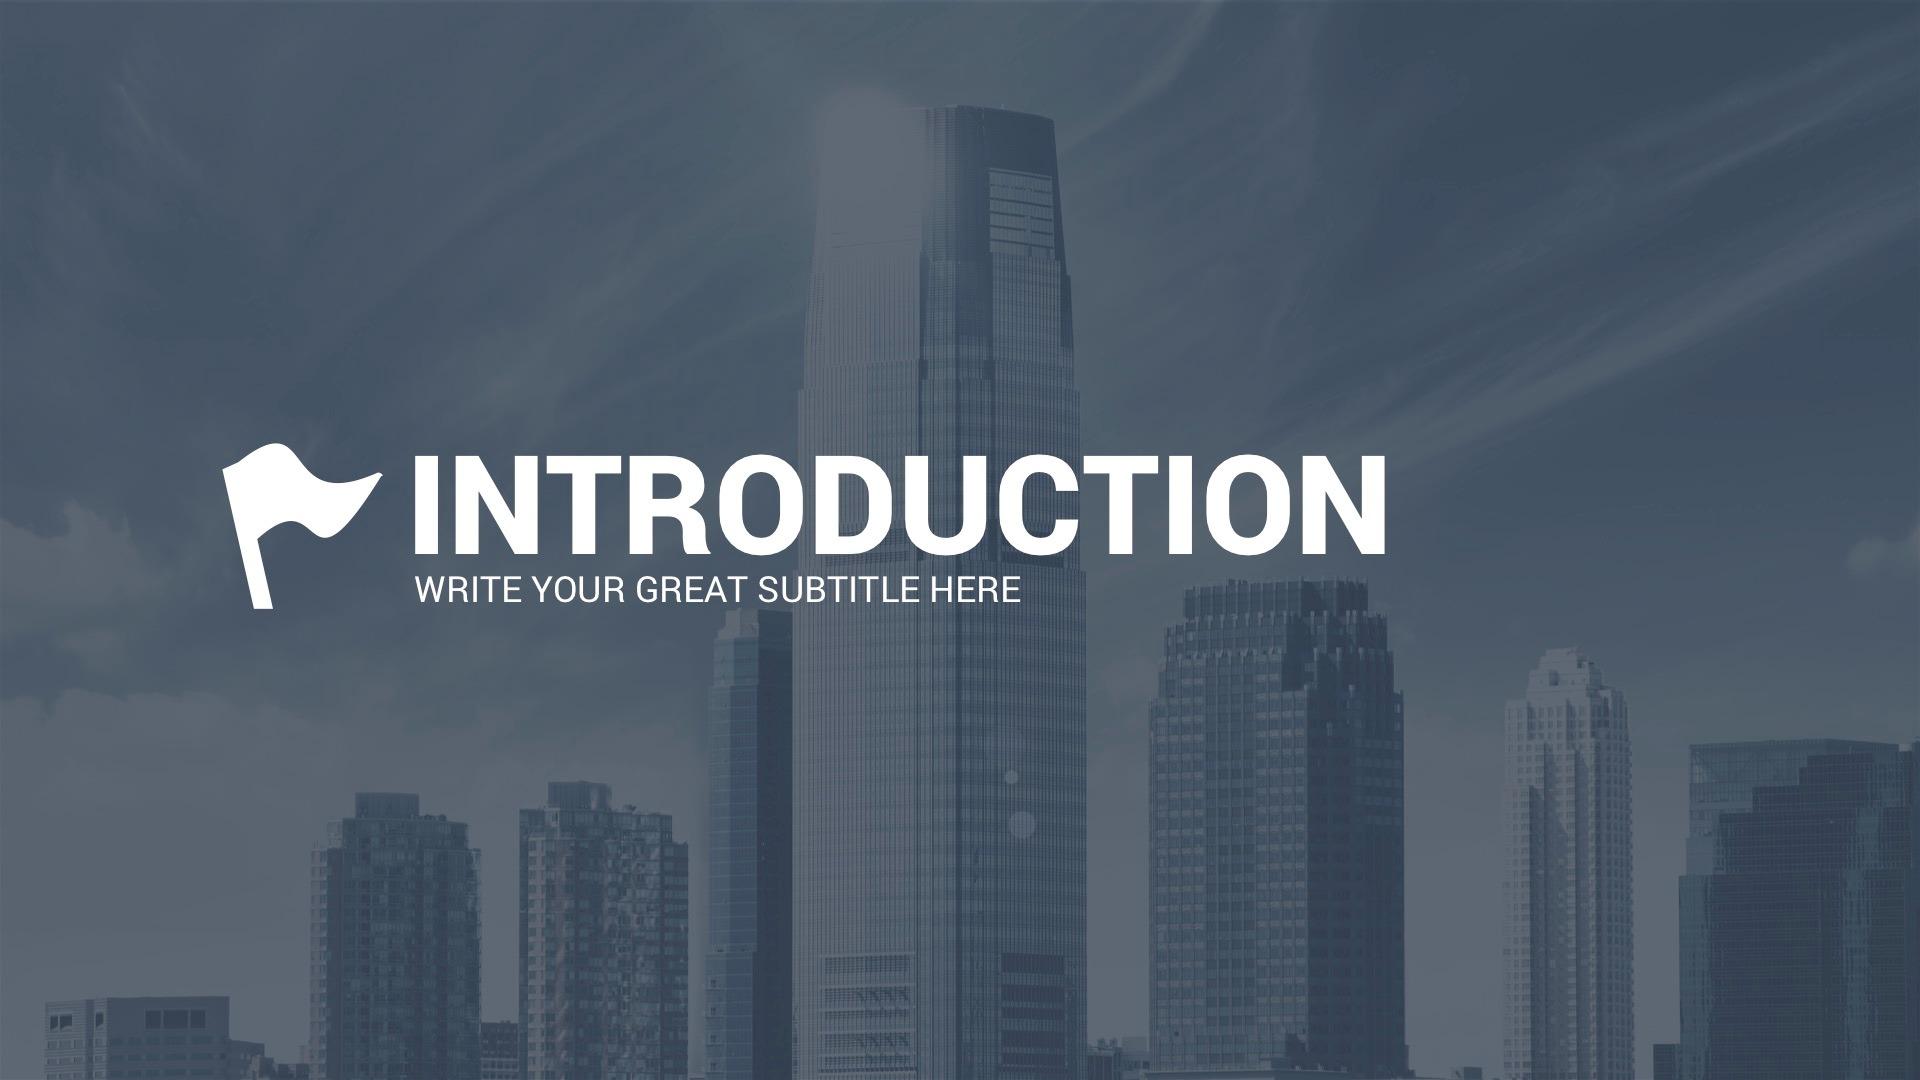 corporate overview powerpoint templatelouistwelve-design, Modern powerpoint